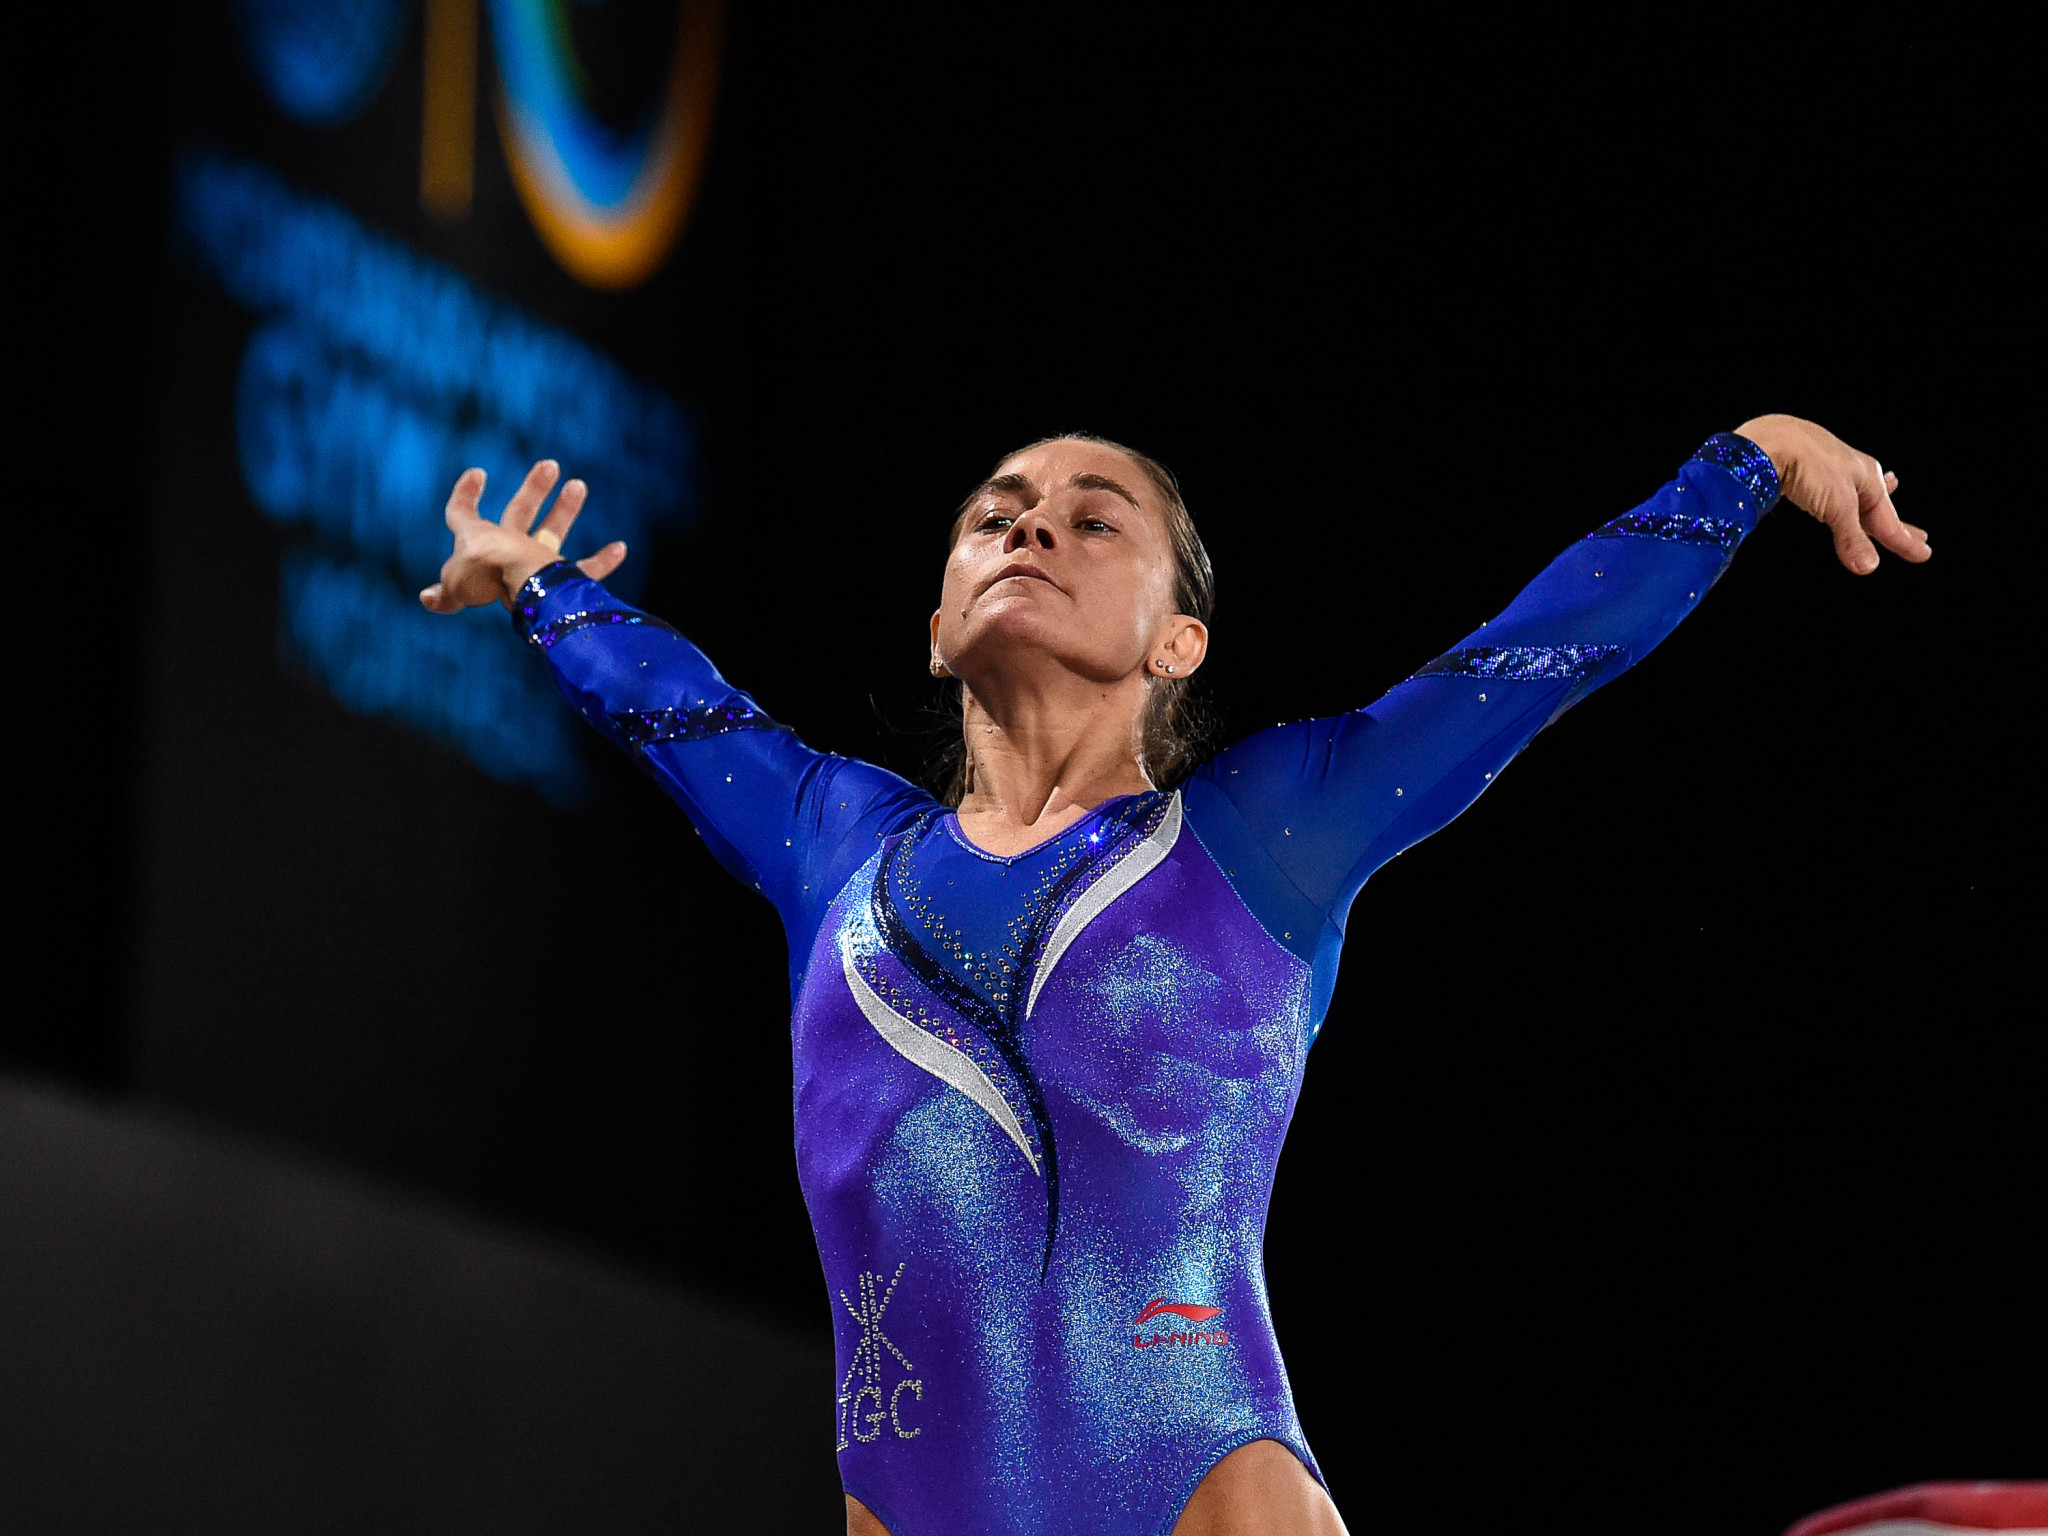 Oksana Chusovitina of Uzbekistan was among the winners today ©Getty Images